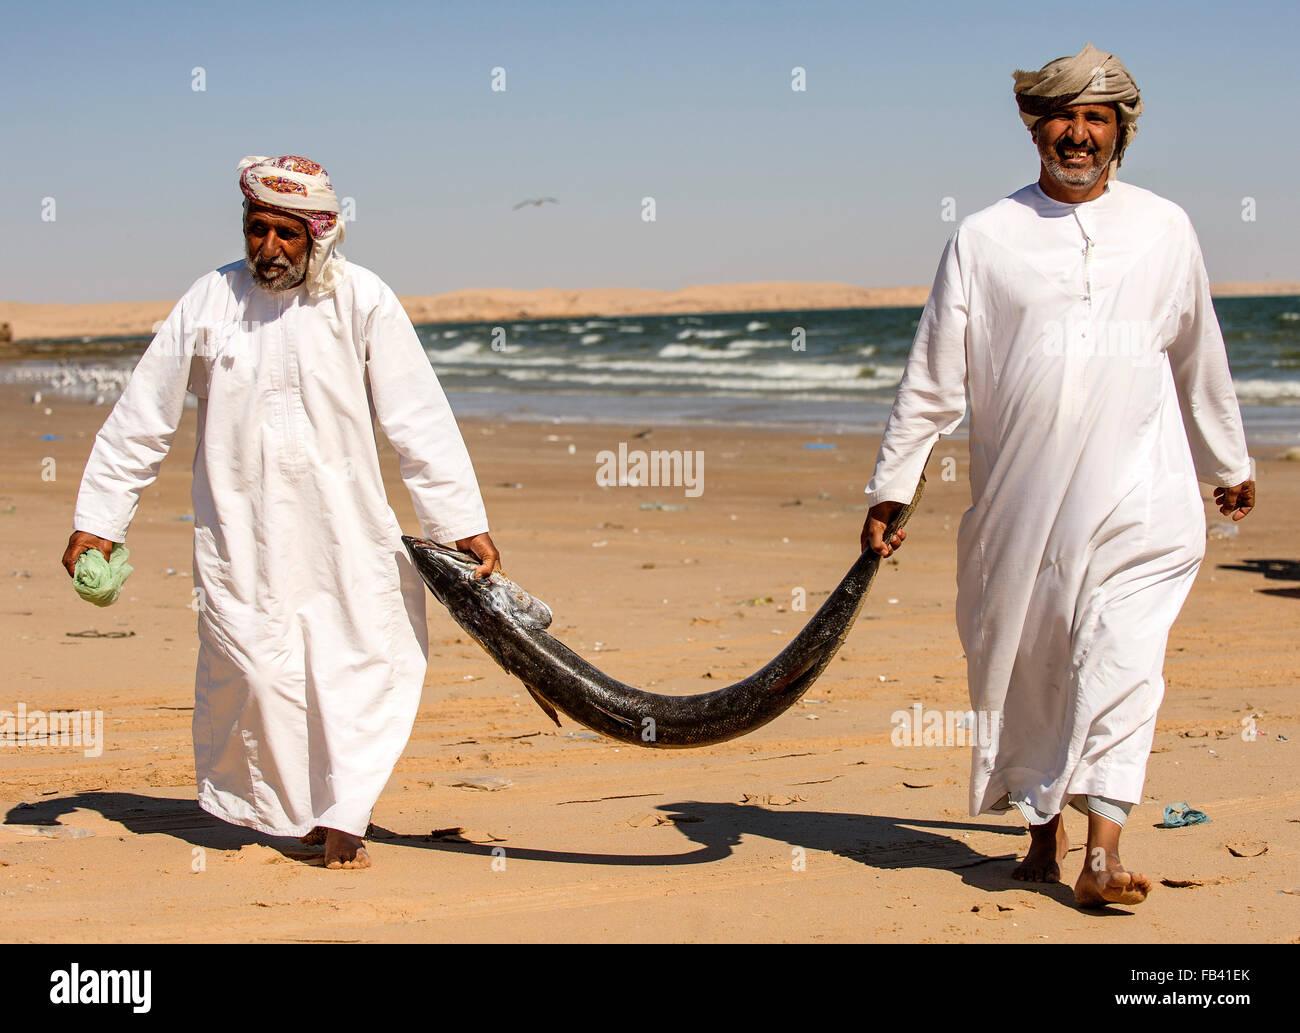 Fishermen and barracuda, Oman - Stock Image